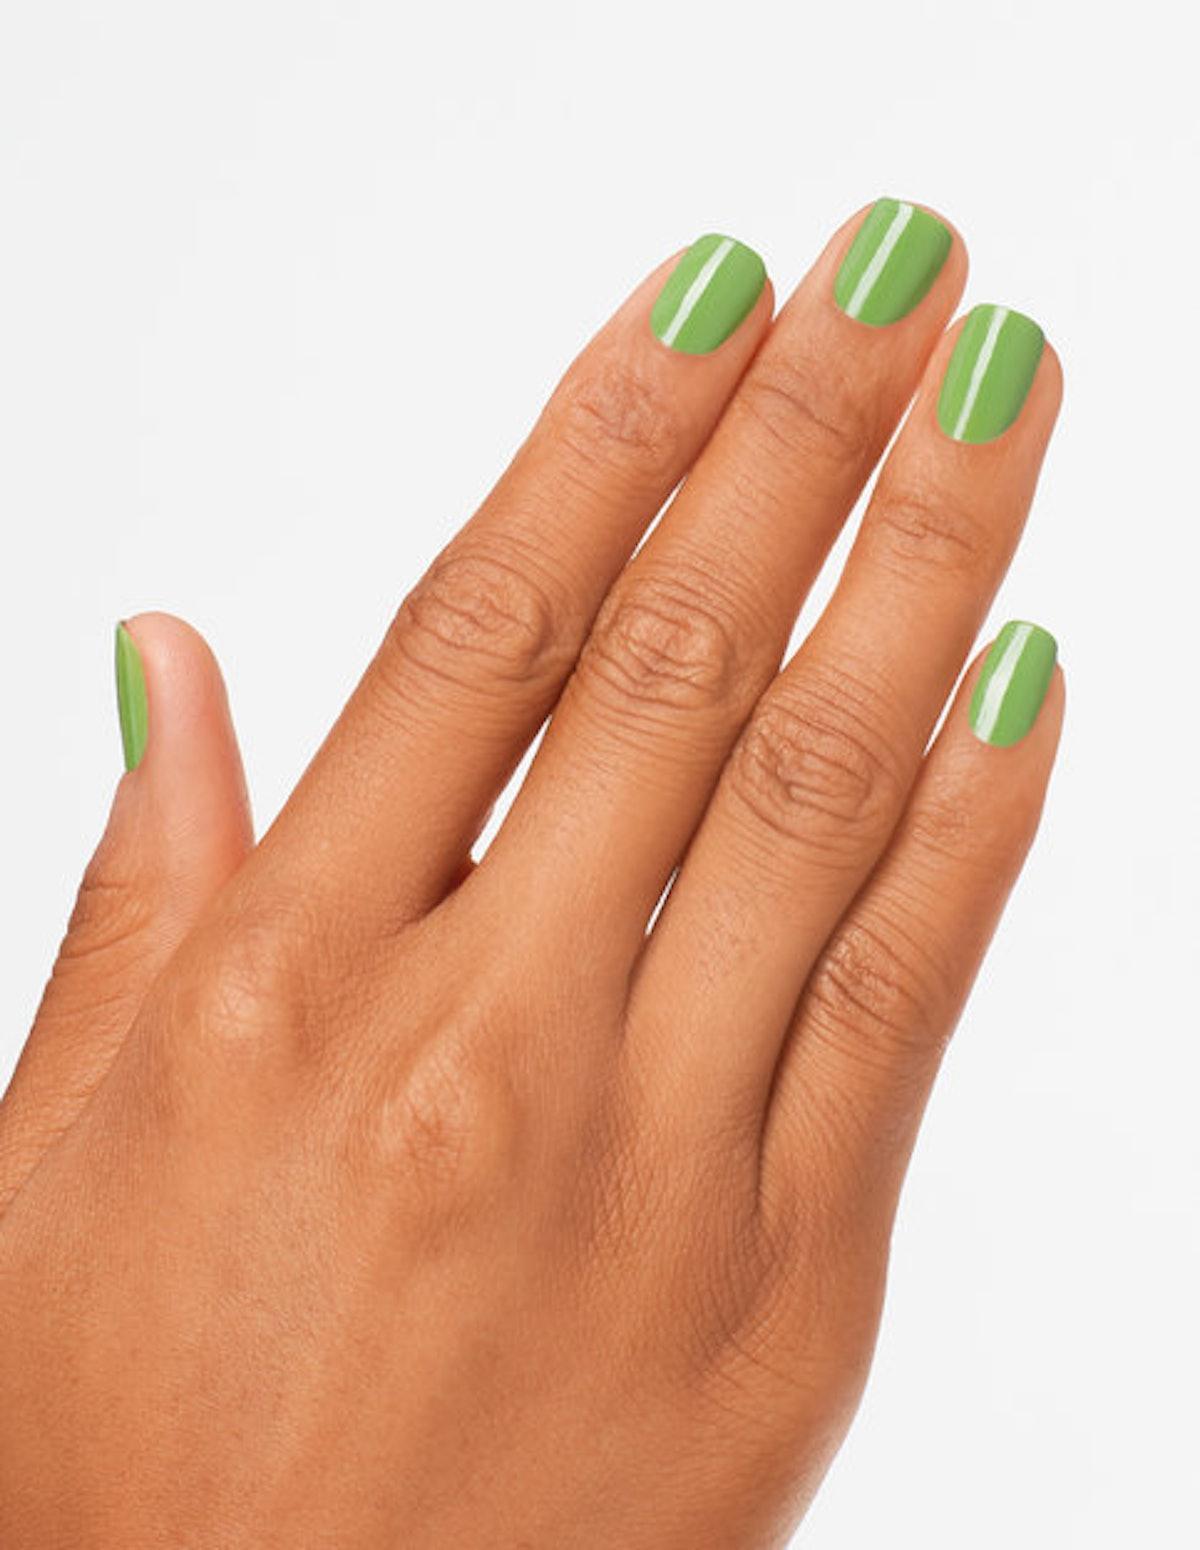 To The Finish Lime! Nail Polish